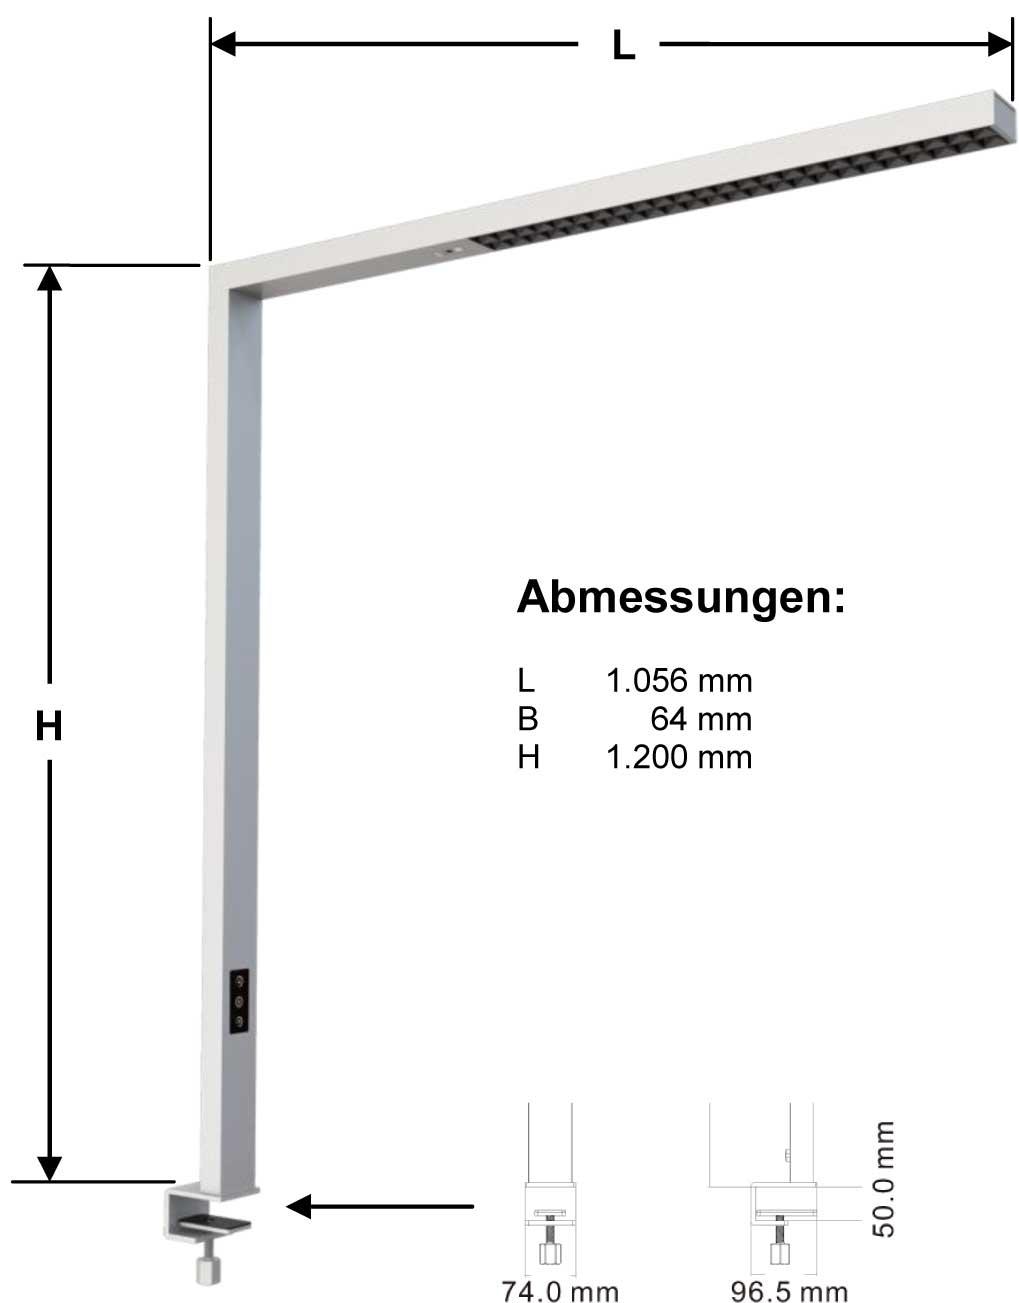 LED-Arbeitsplatzleuchte AL-06-80-FV